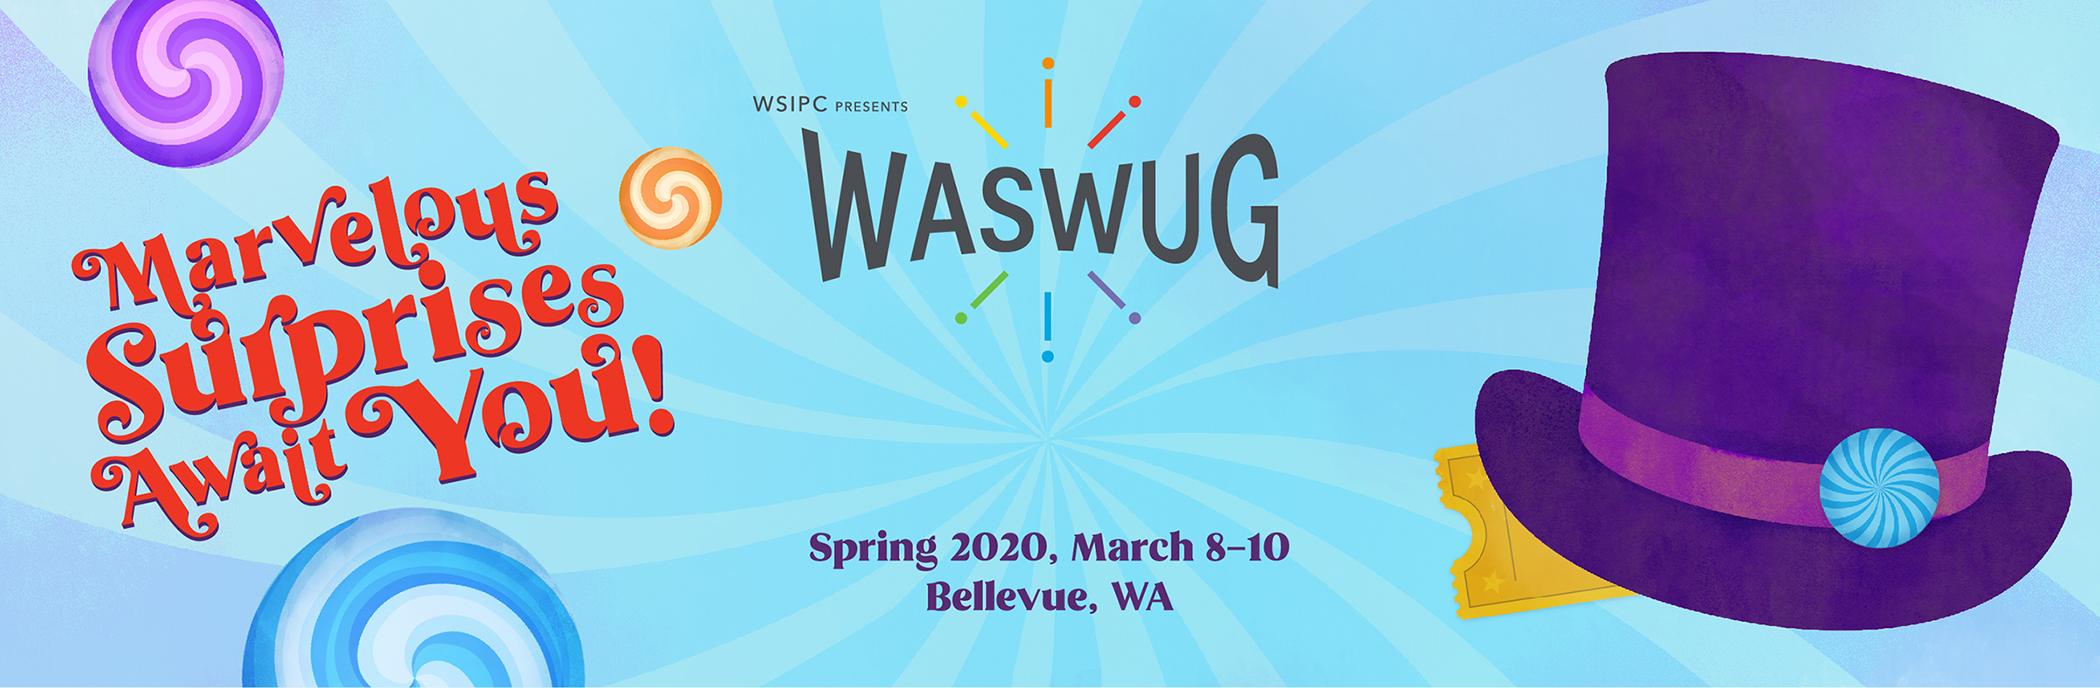 WASWUG Spring 2020